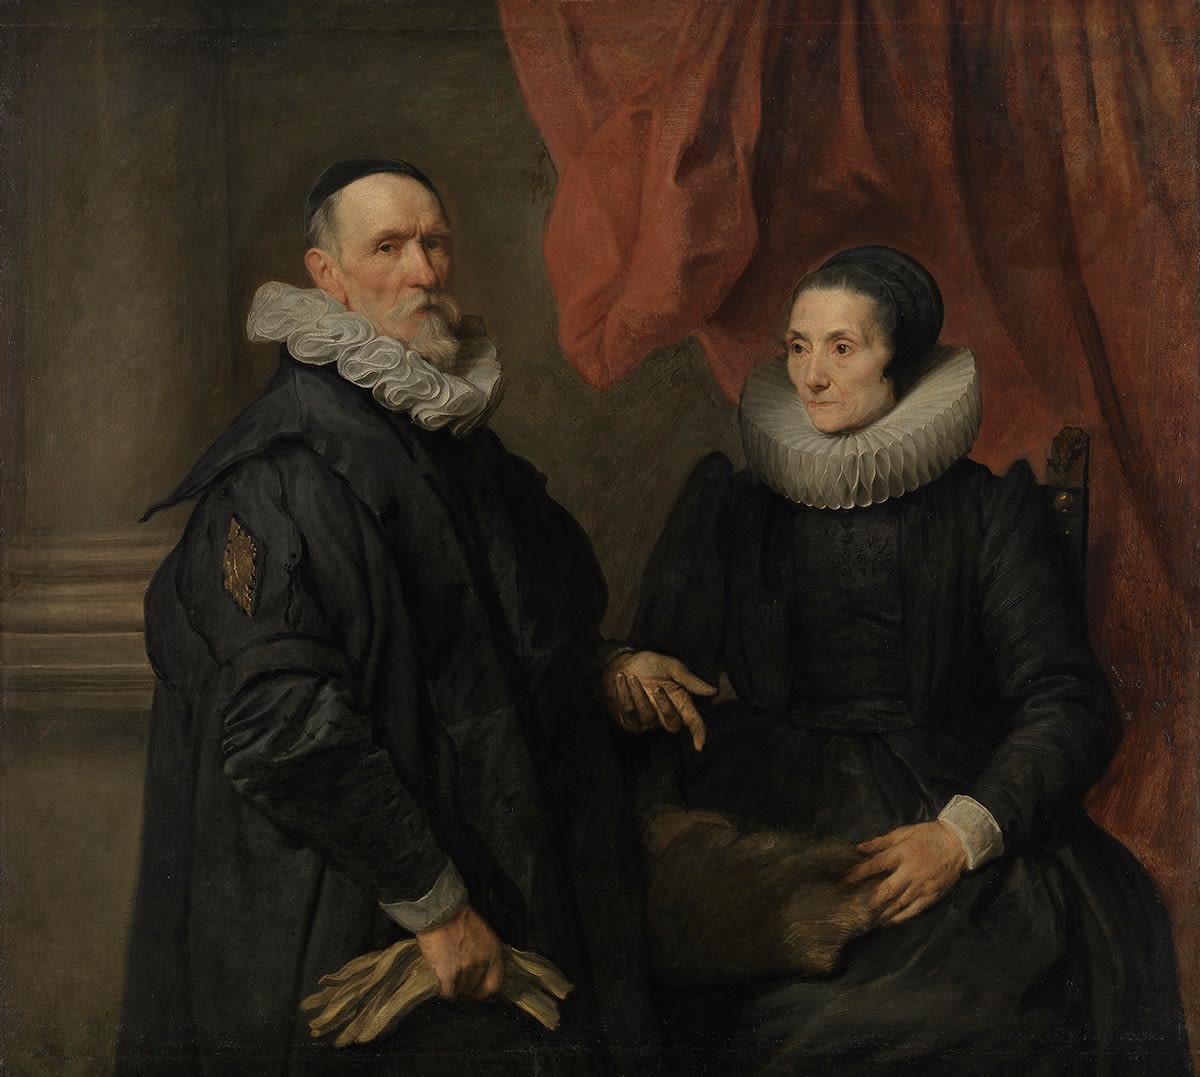 Der Maler Jan de Wael und seine Frau Gertrud de Jode